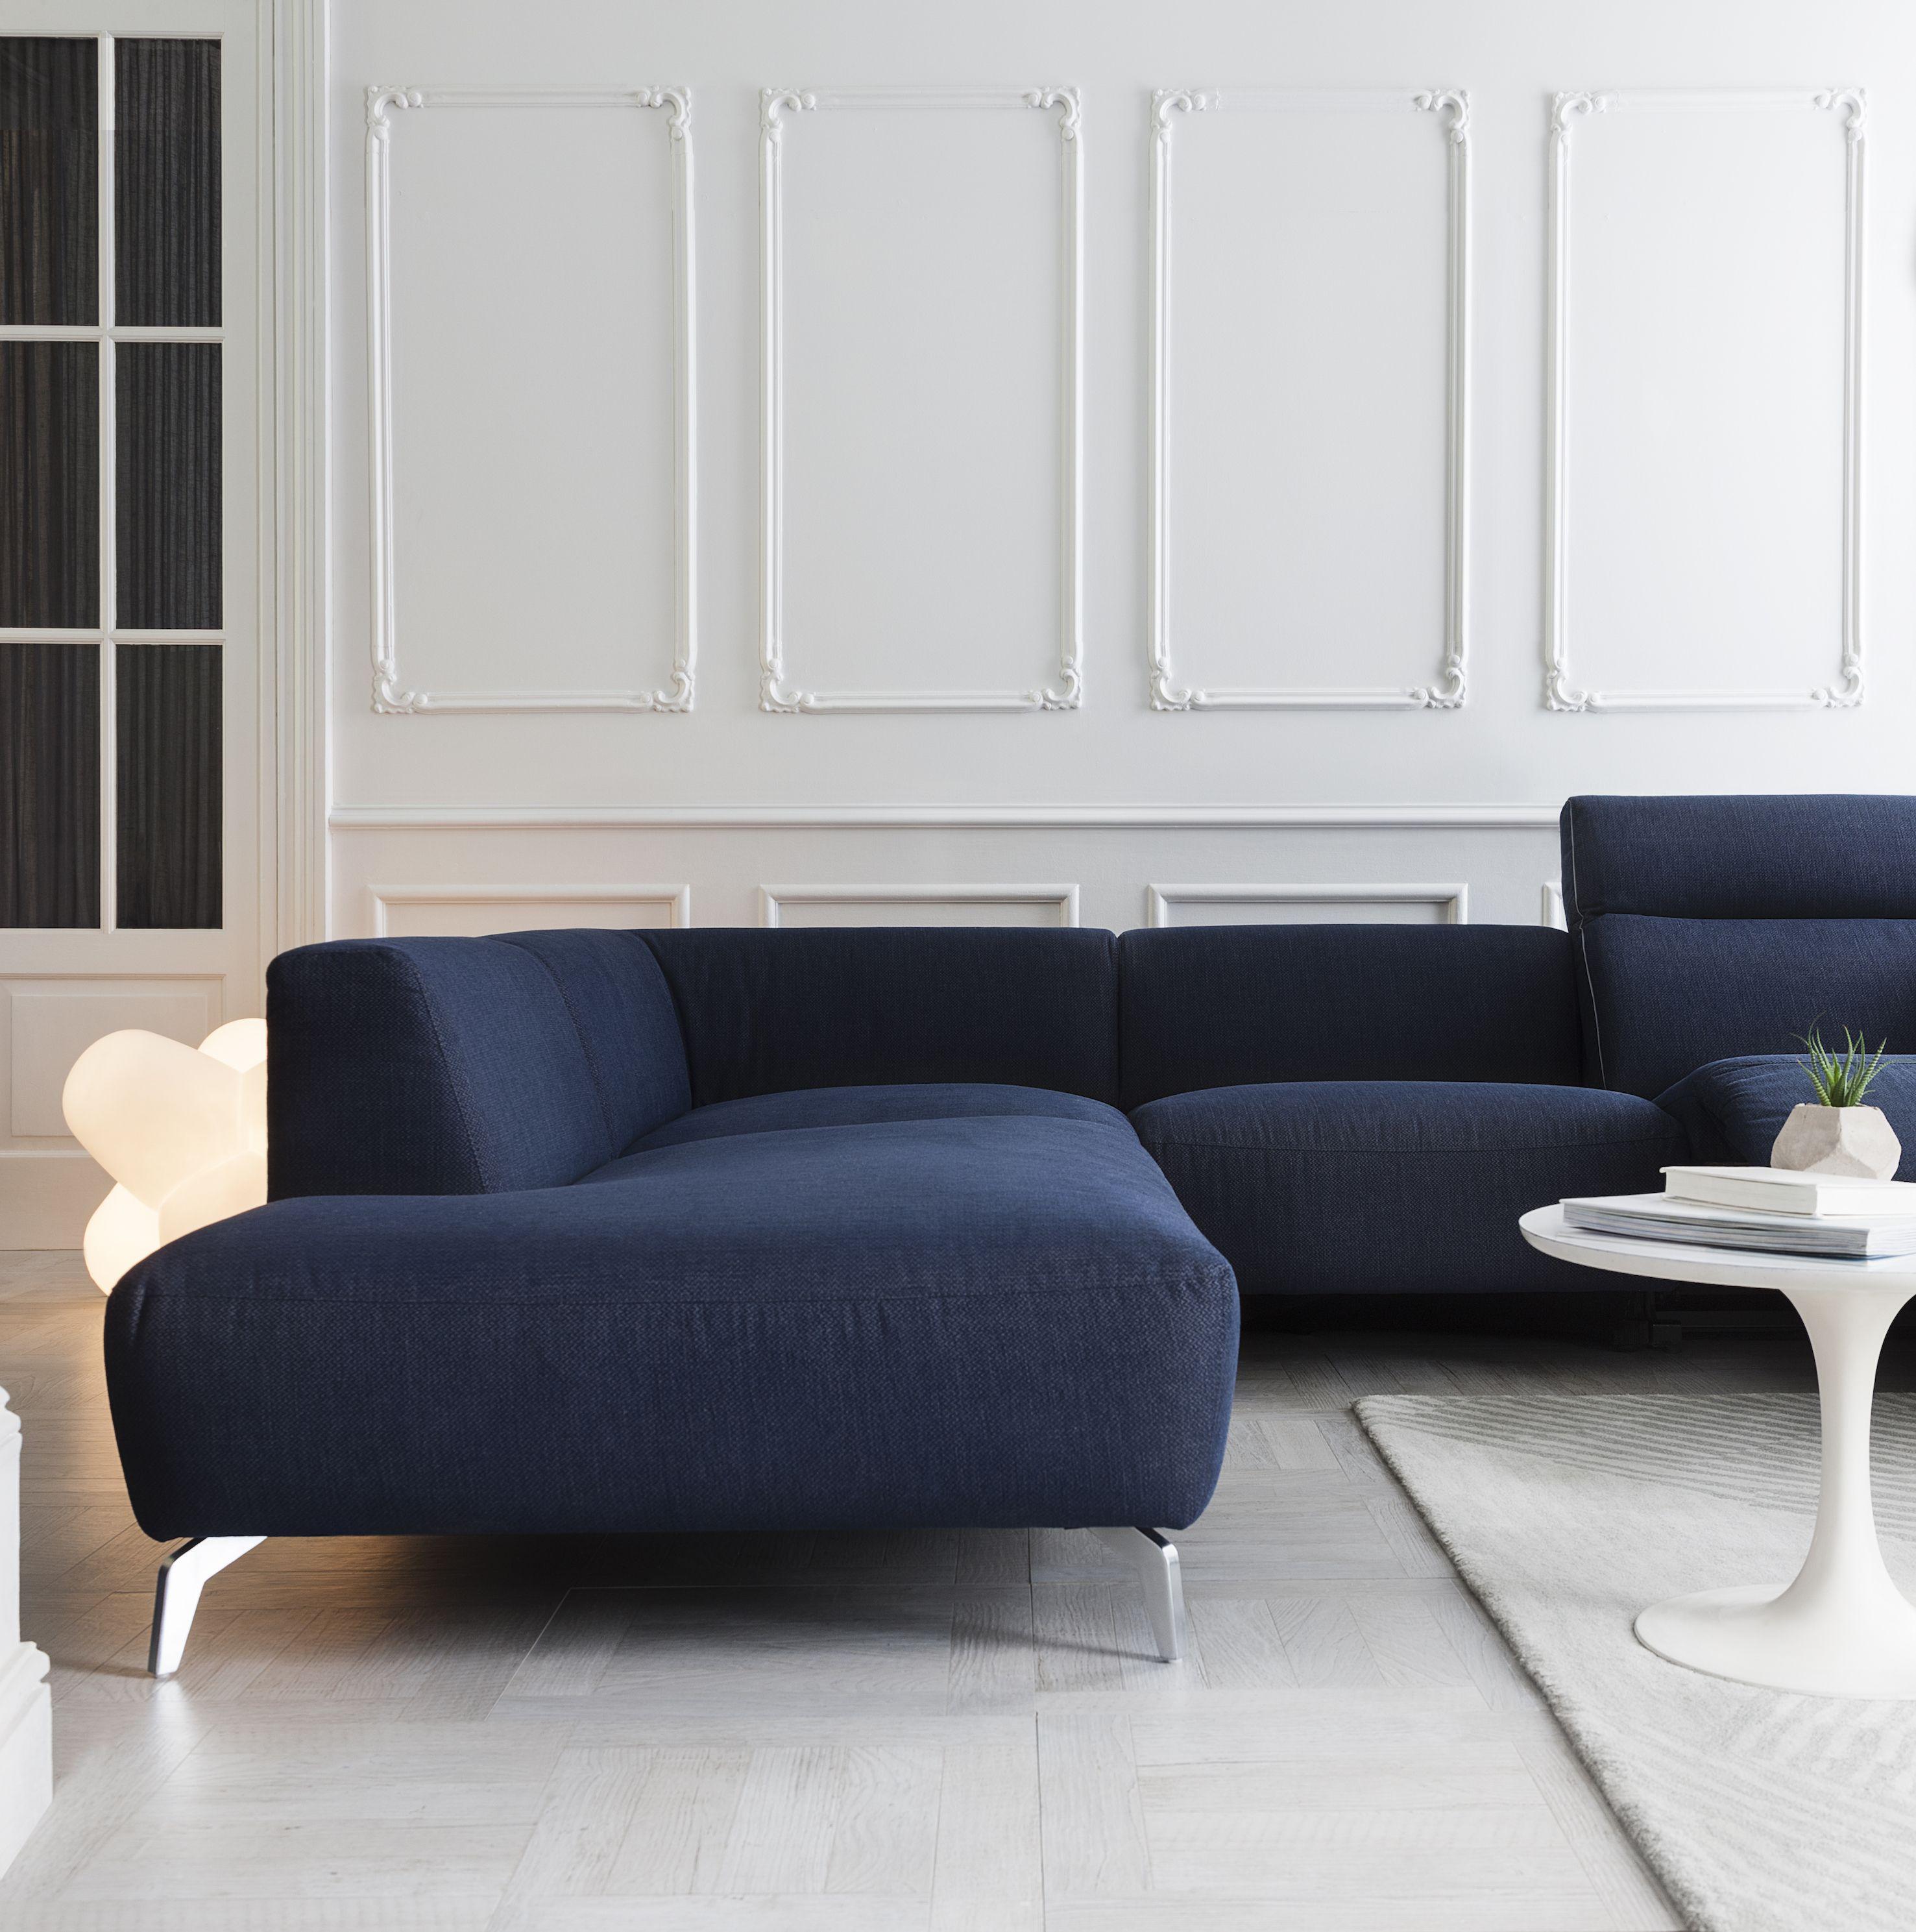 ROM SOFAS New Romano sofa